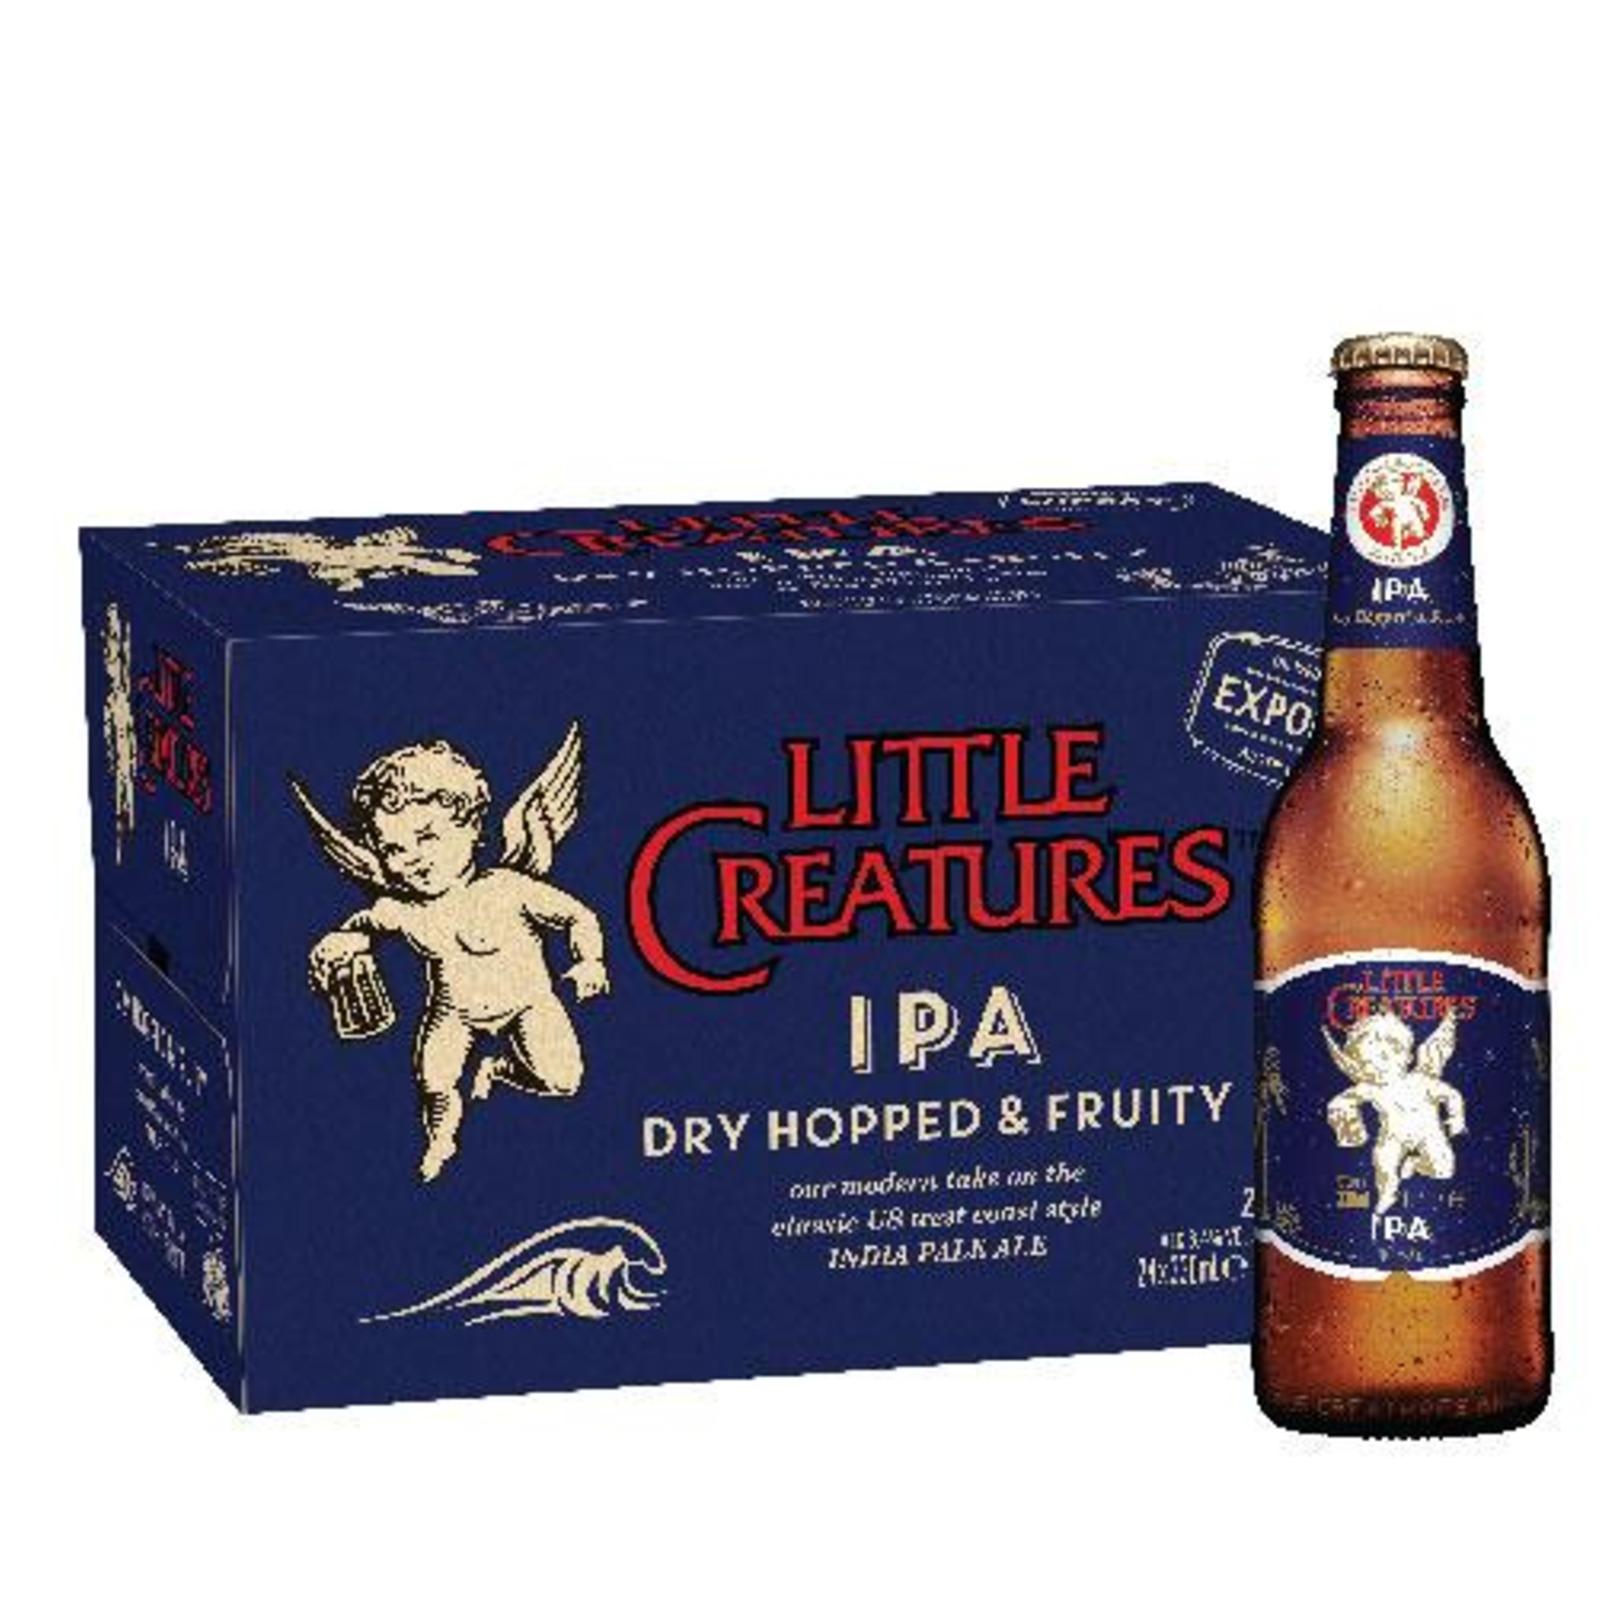 Little Creatures IPA 330ml